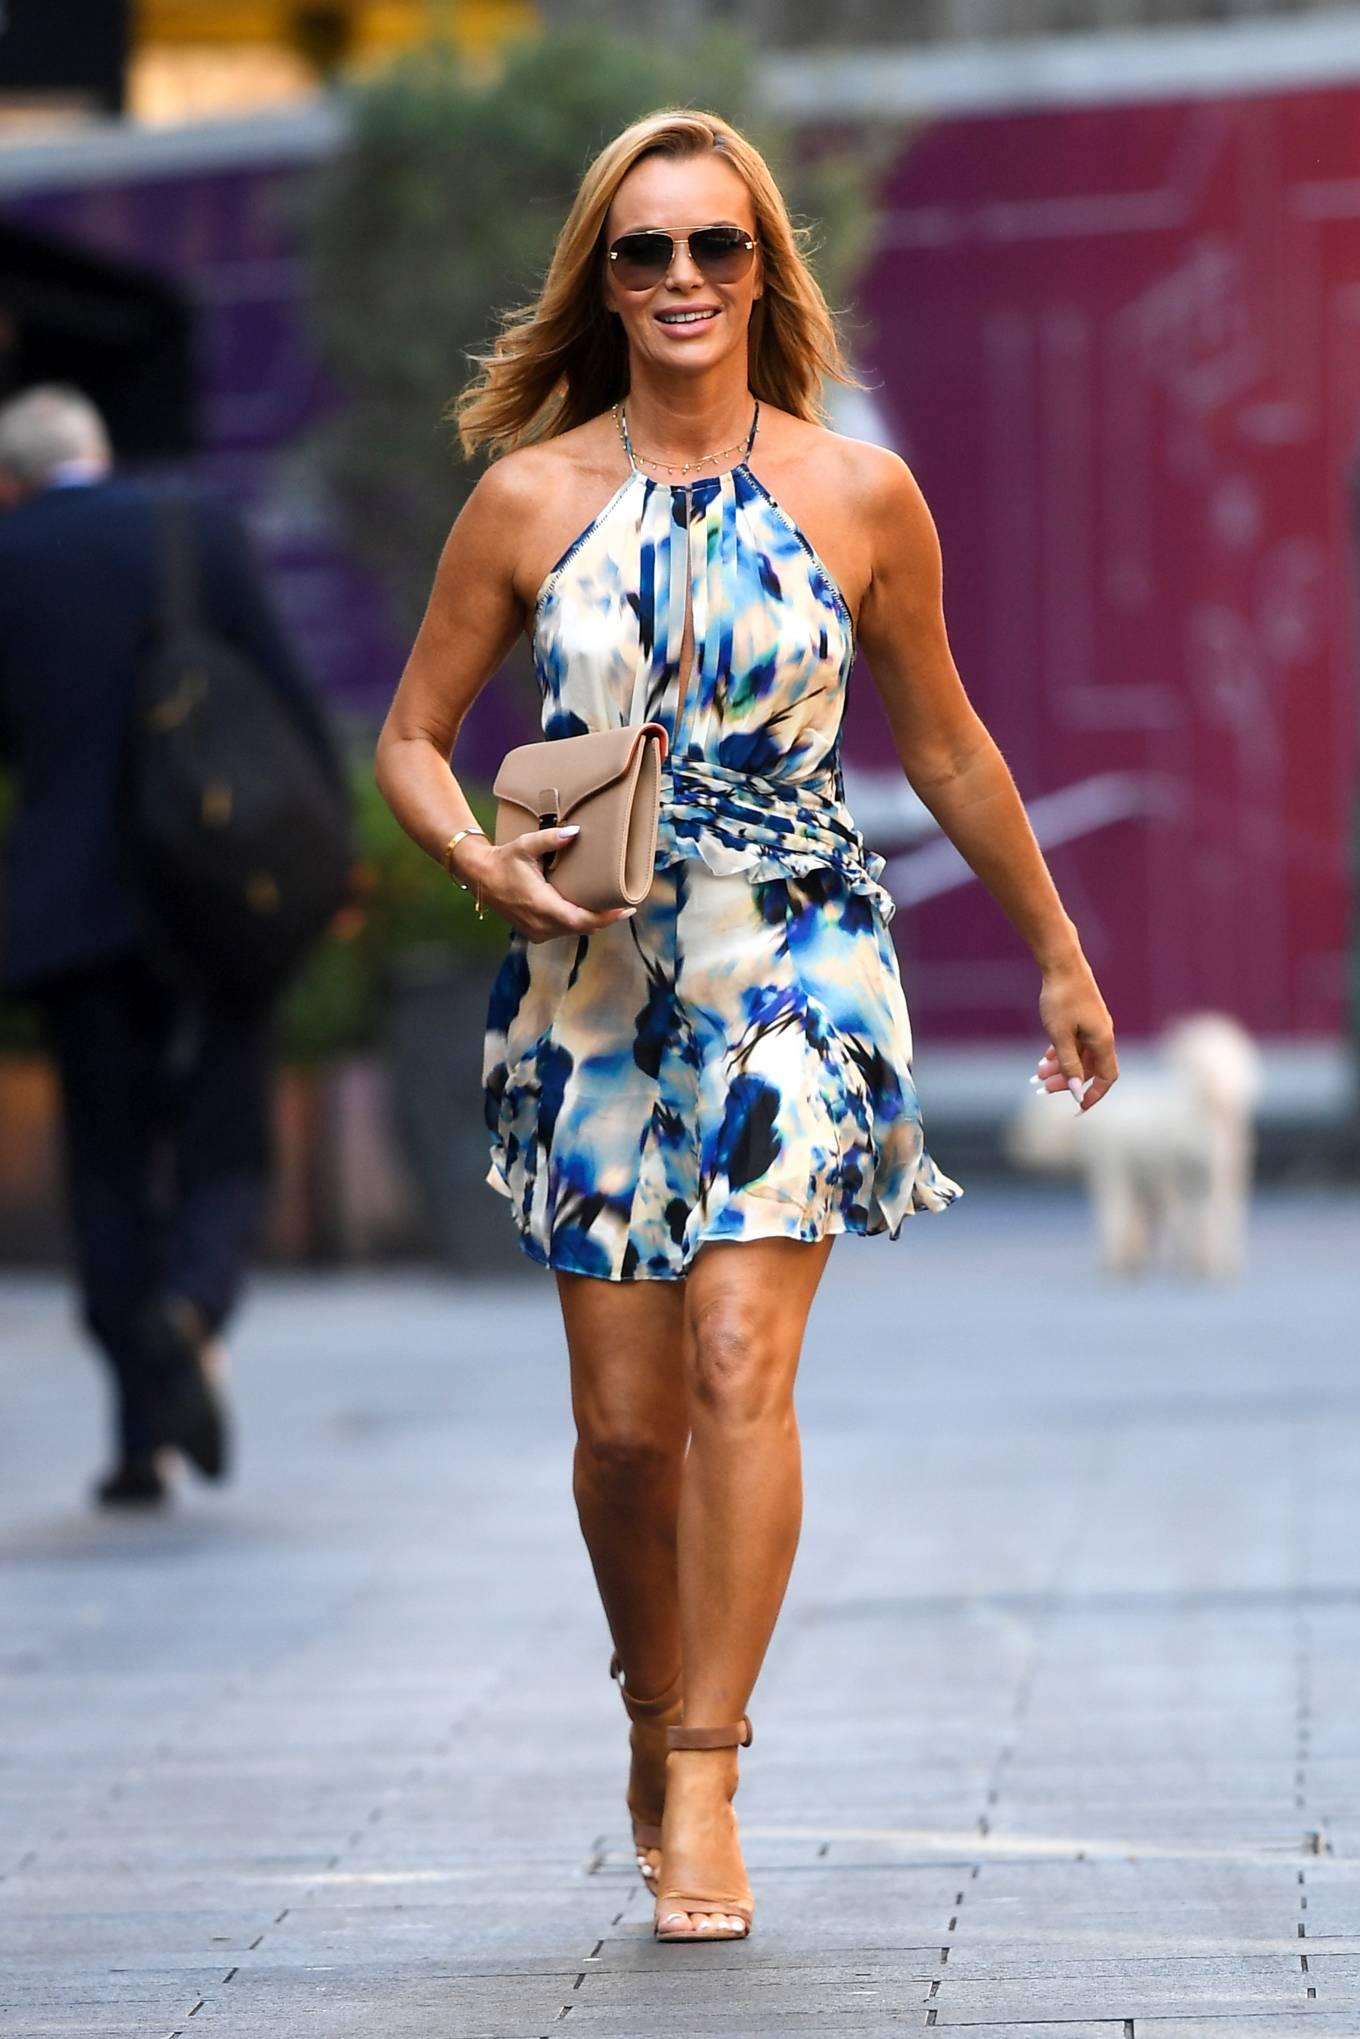 Amanda Holden 2021 : Amanda Holden – In a sky blue summer dress is seen at Global Radio Studios in London-14